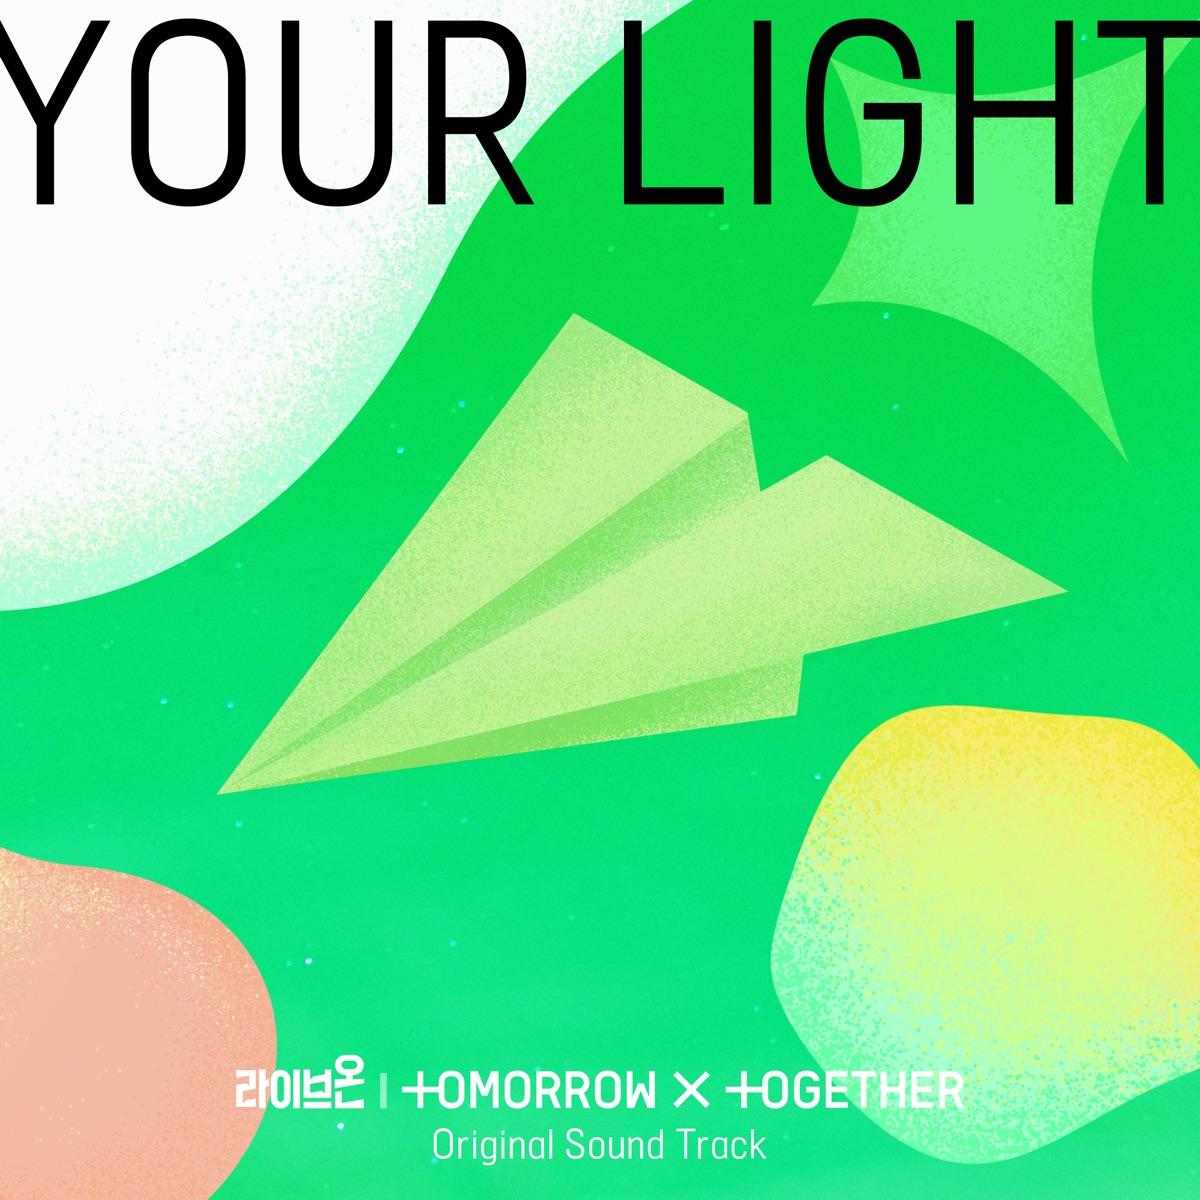 『TOMORROW X TOGETHER - Your Light』収録の『Your Light』ジャケット